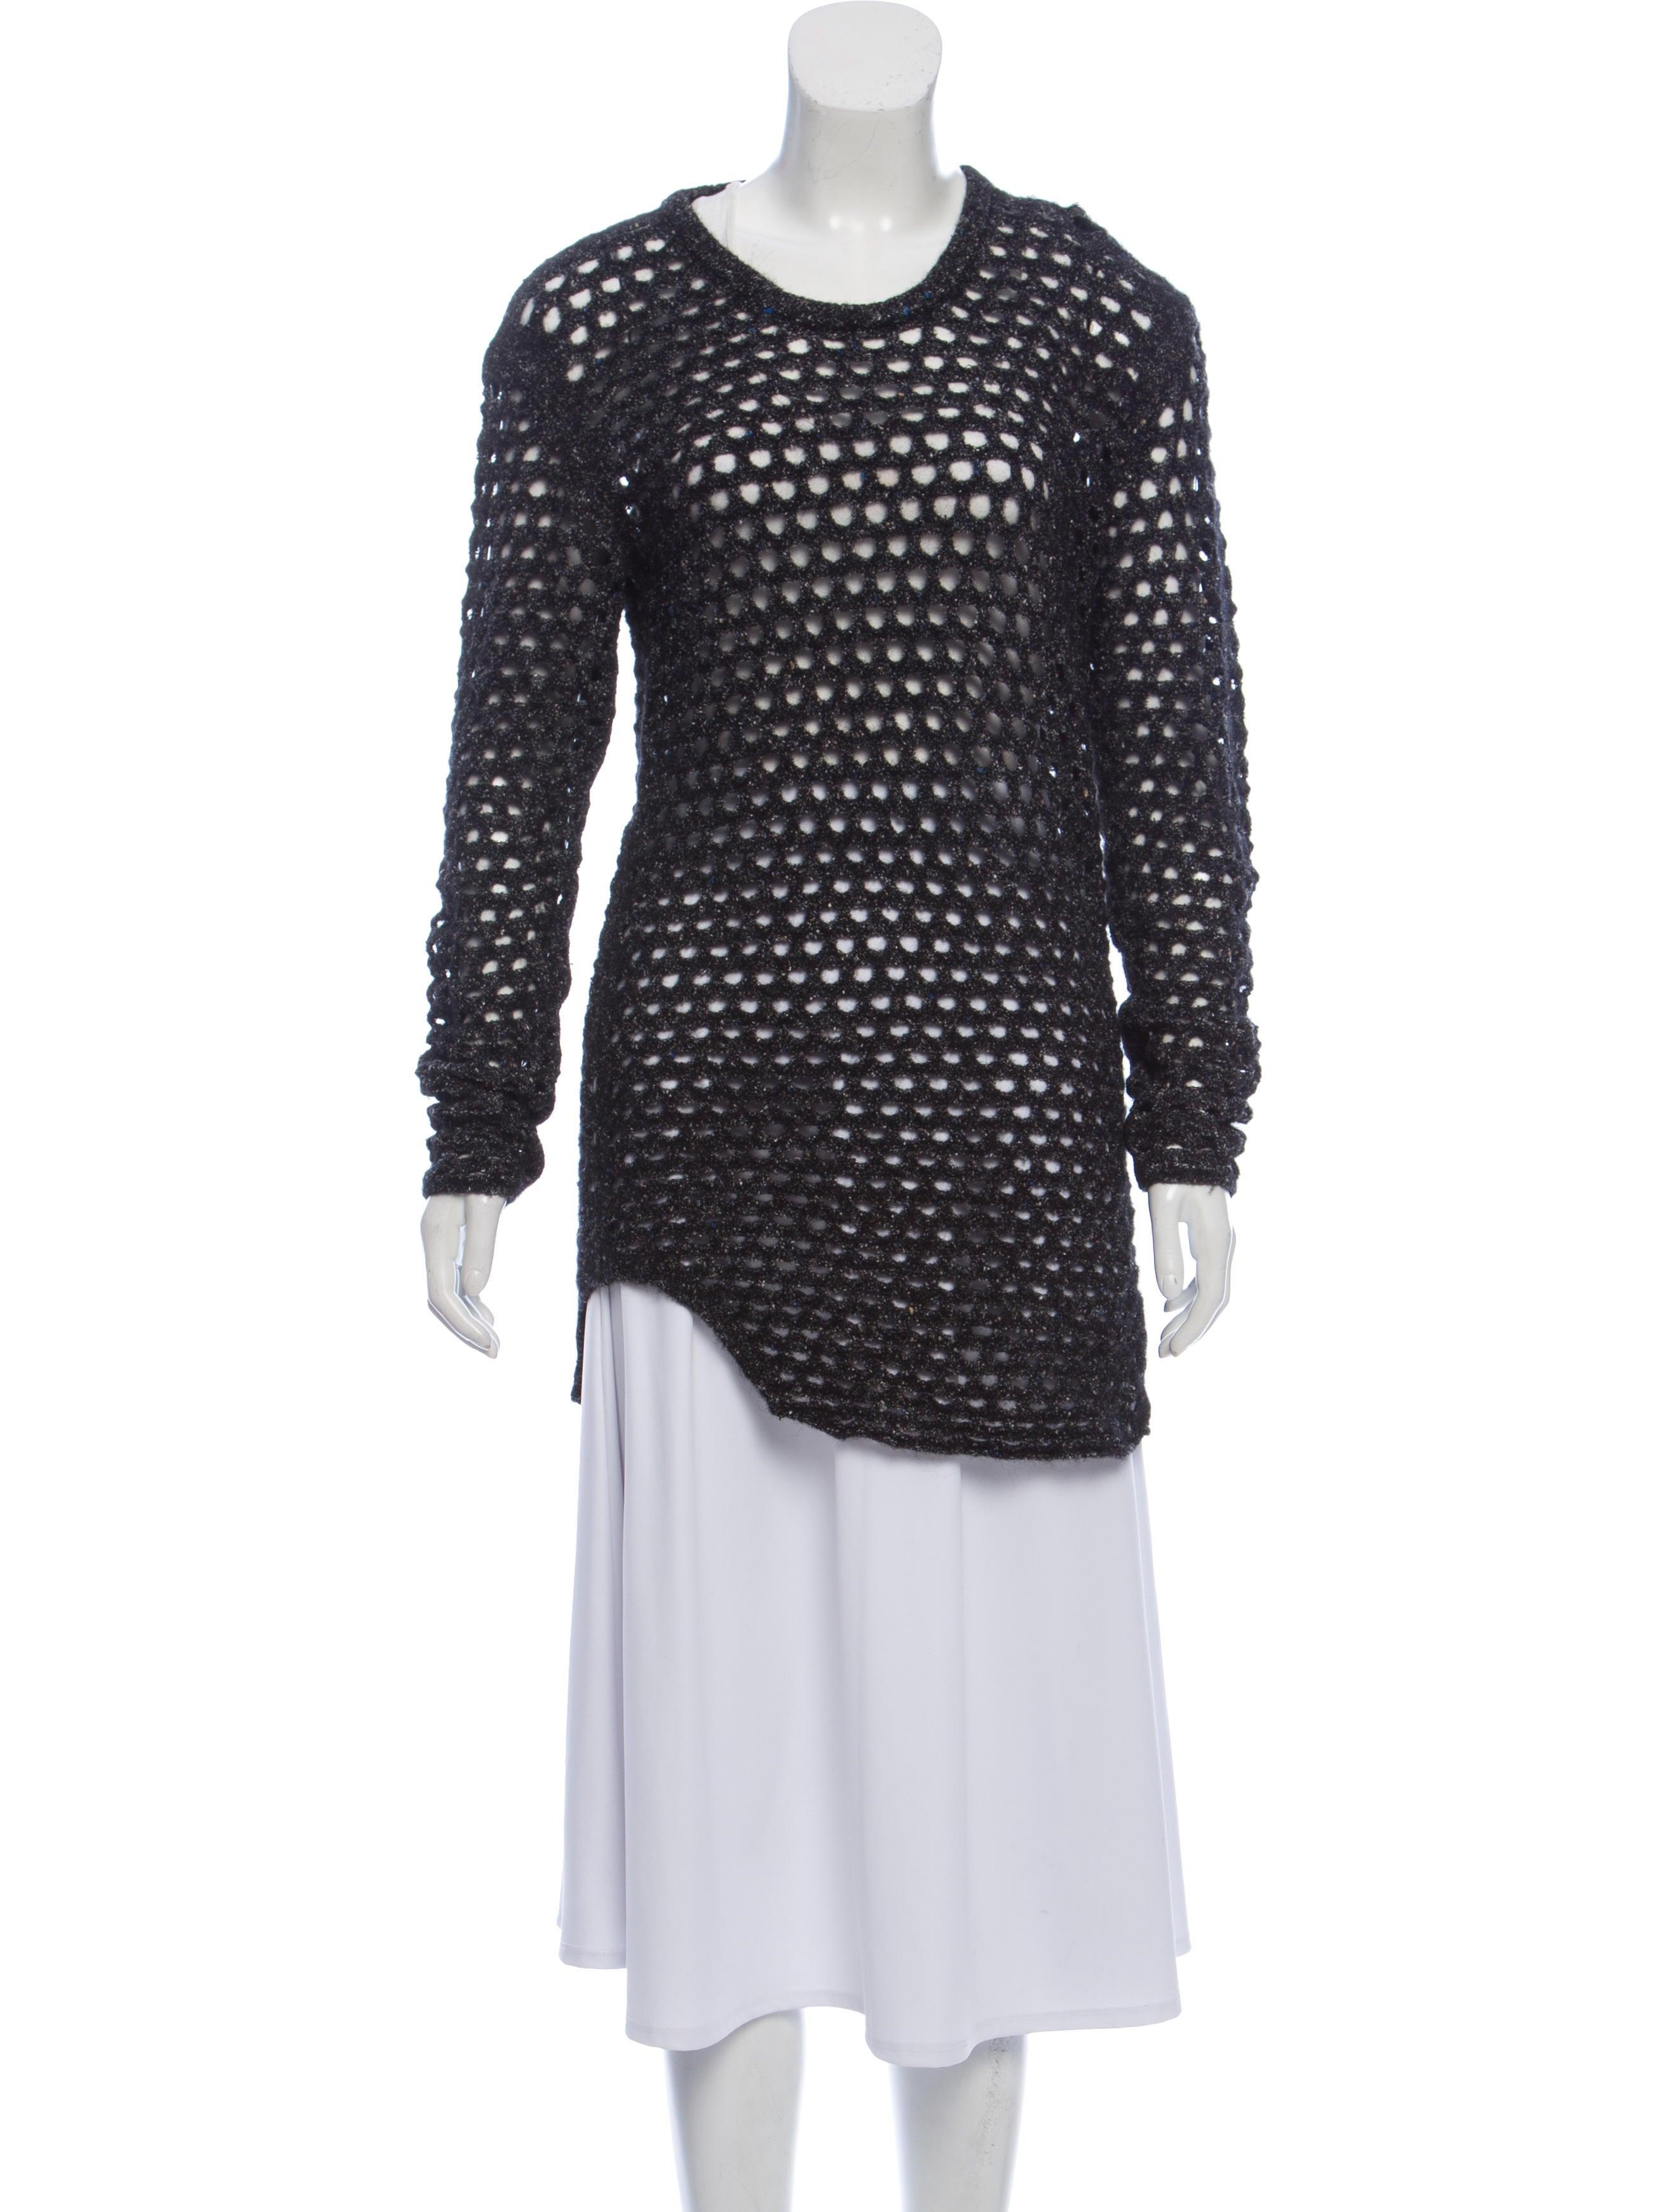 Realreal Clothing Wir48817The Dress Sweater Iro Open Knit qSUMVpz